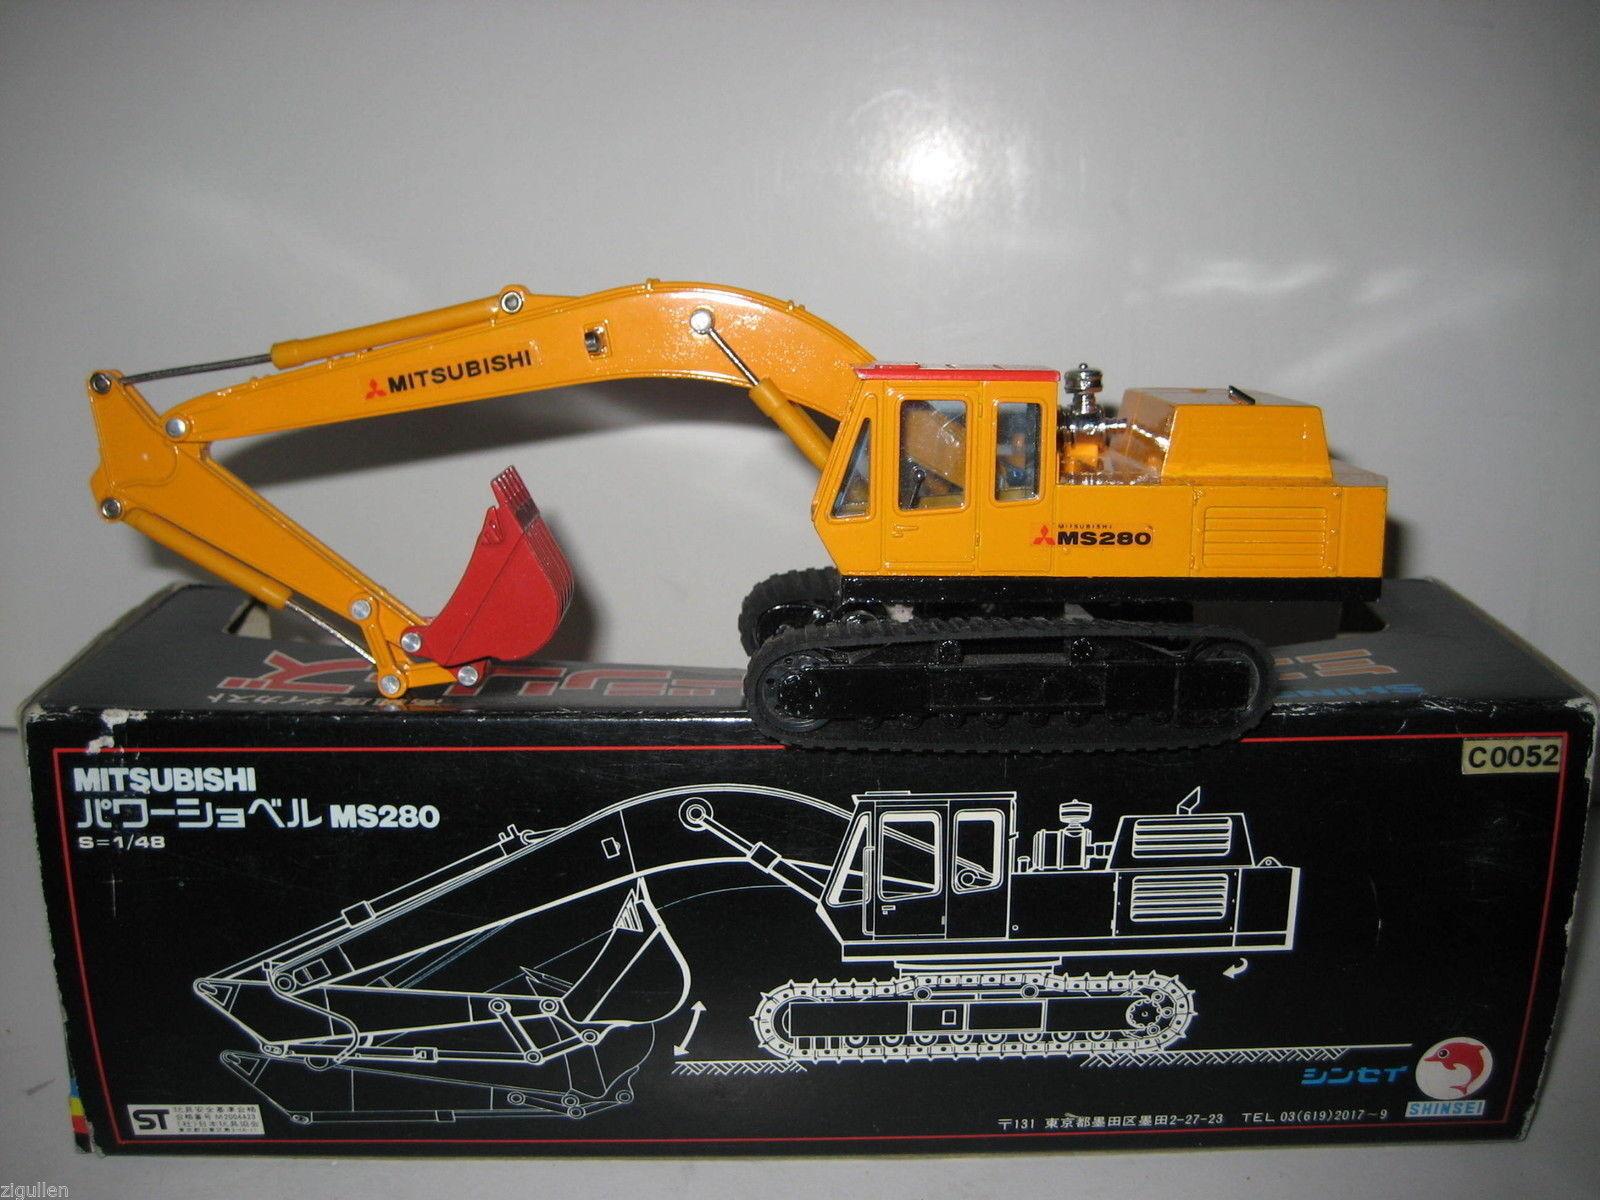 MITSUBISHI MS 280 Excavator Deep Spoon Shinsei 1 48 Ovp Rar